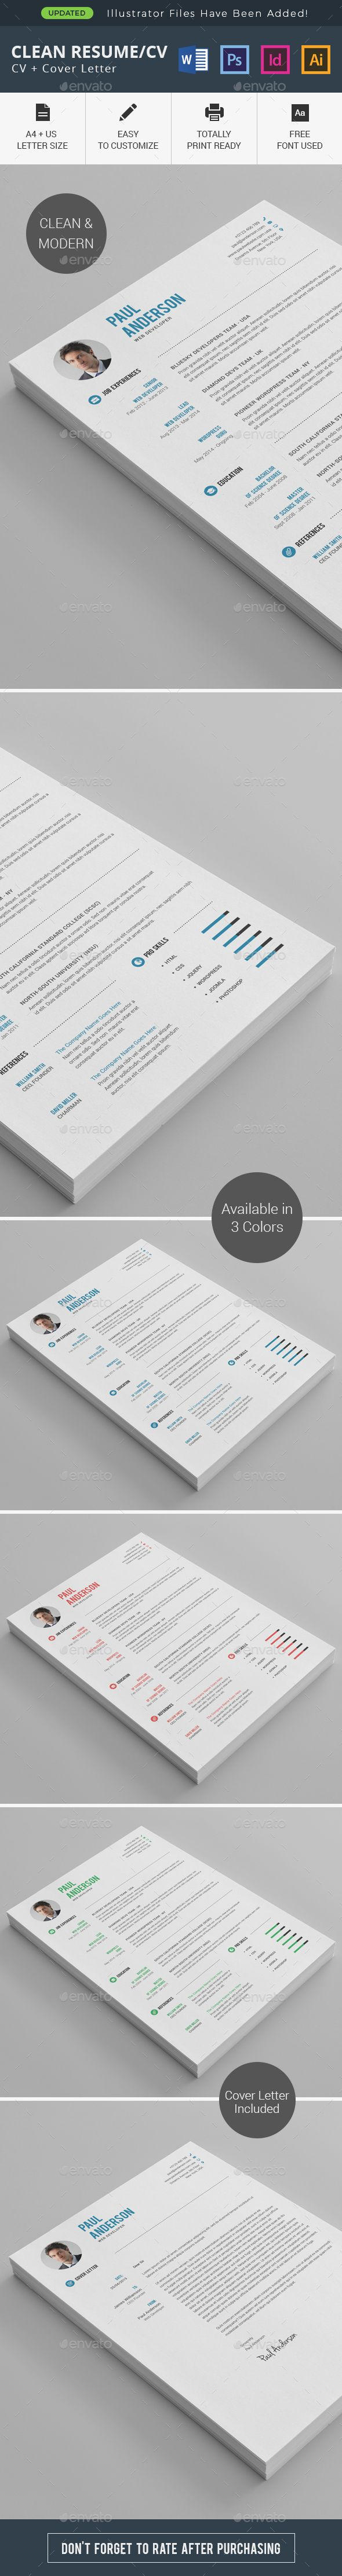 Clean #Resume/CV - Resumes #Stationery